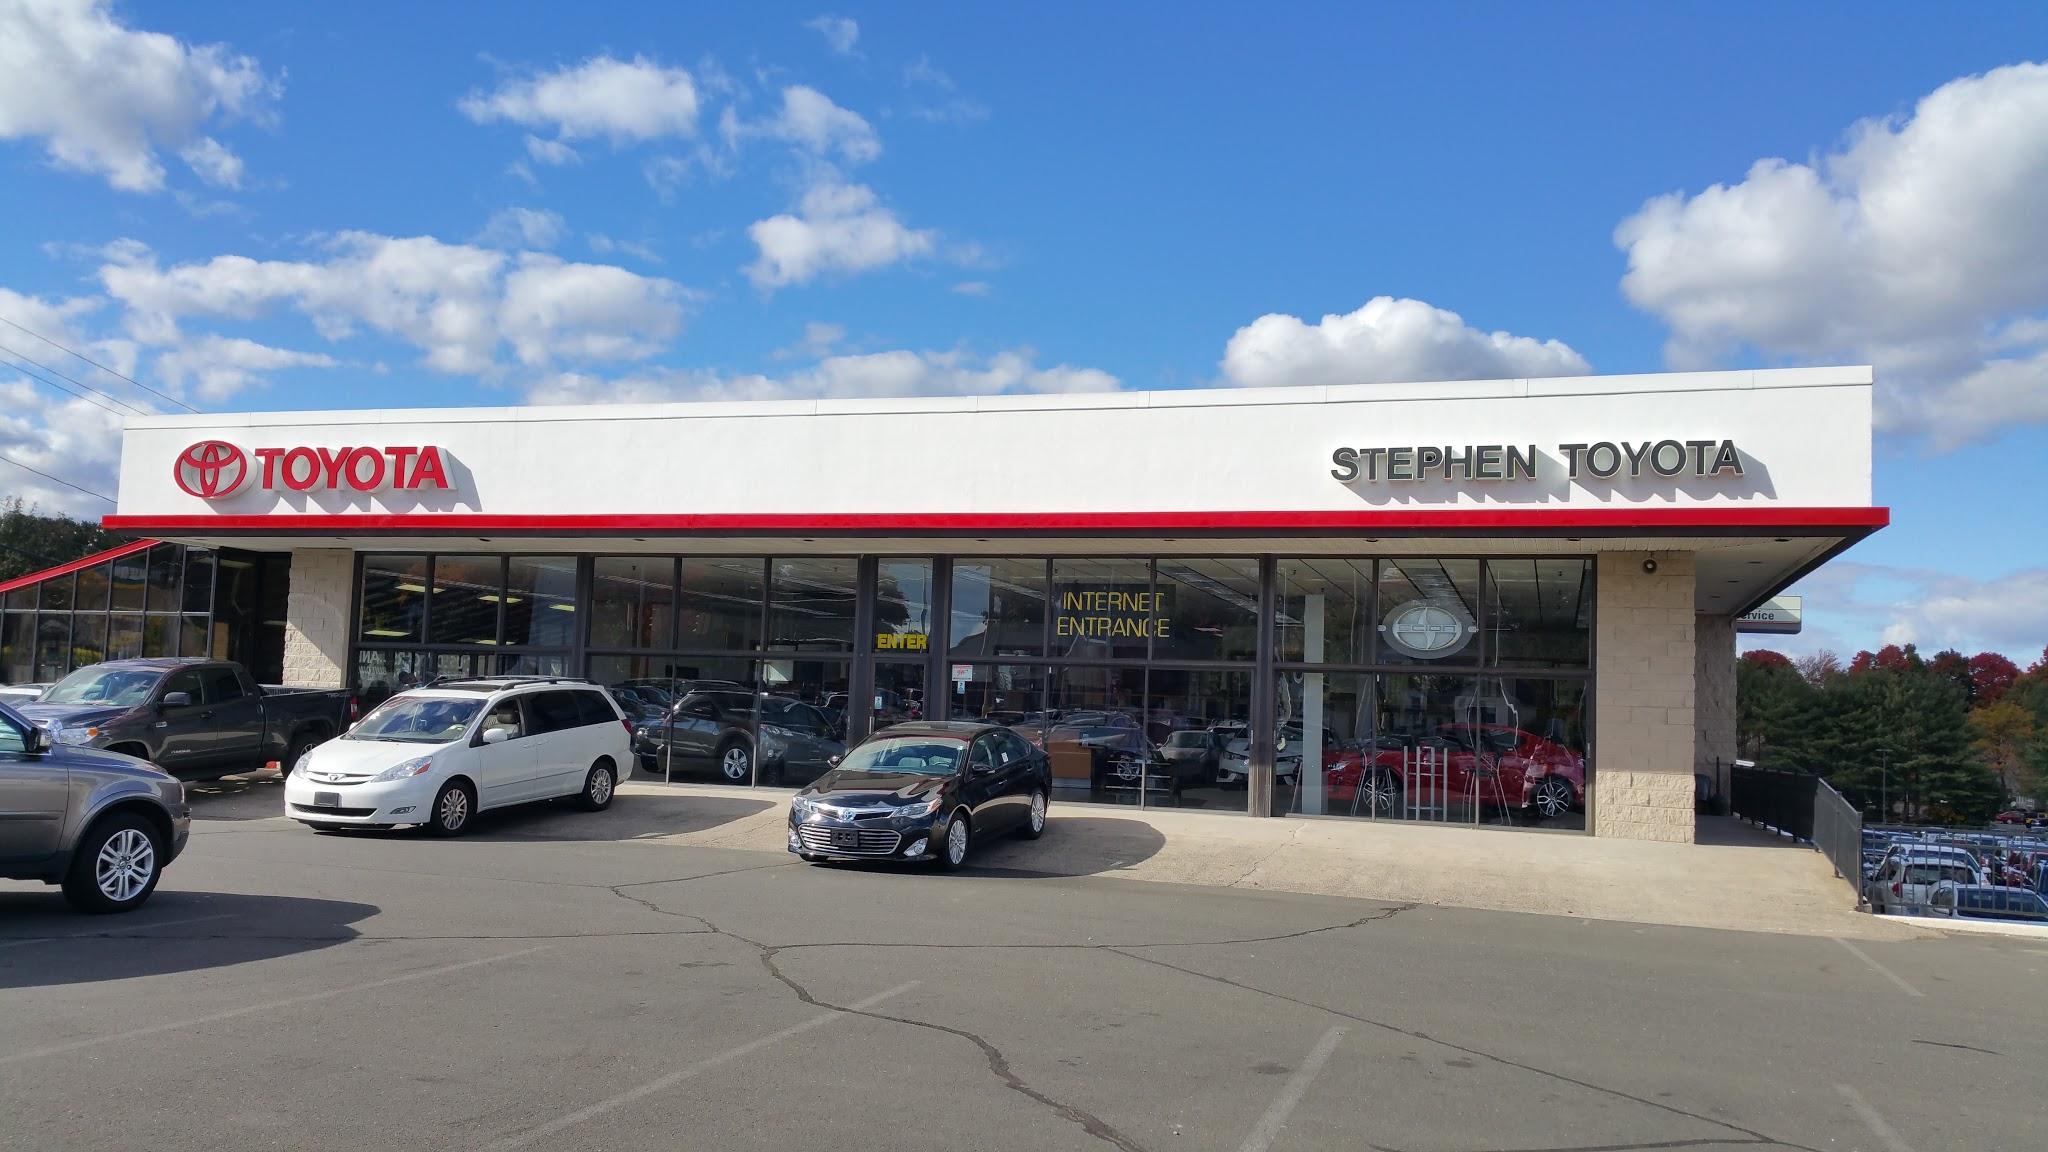 Stephen Toyota 1069 Farmington Ave Bristol Ct 06010 Yp Com